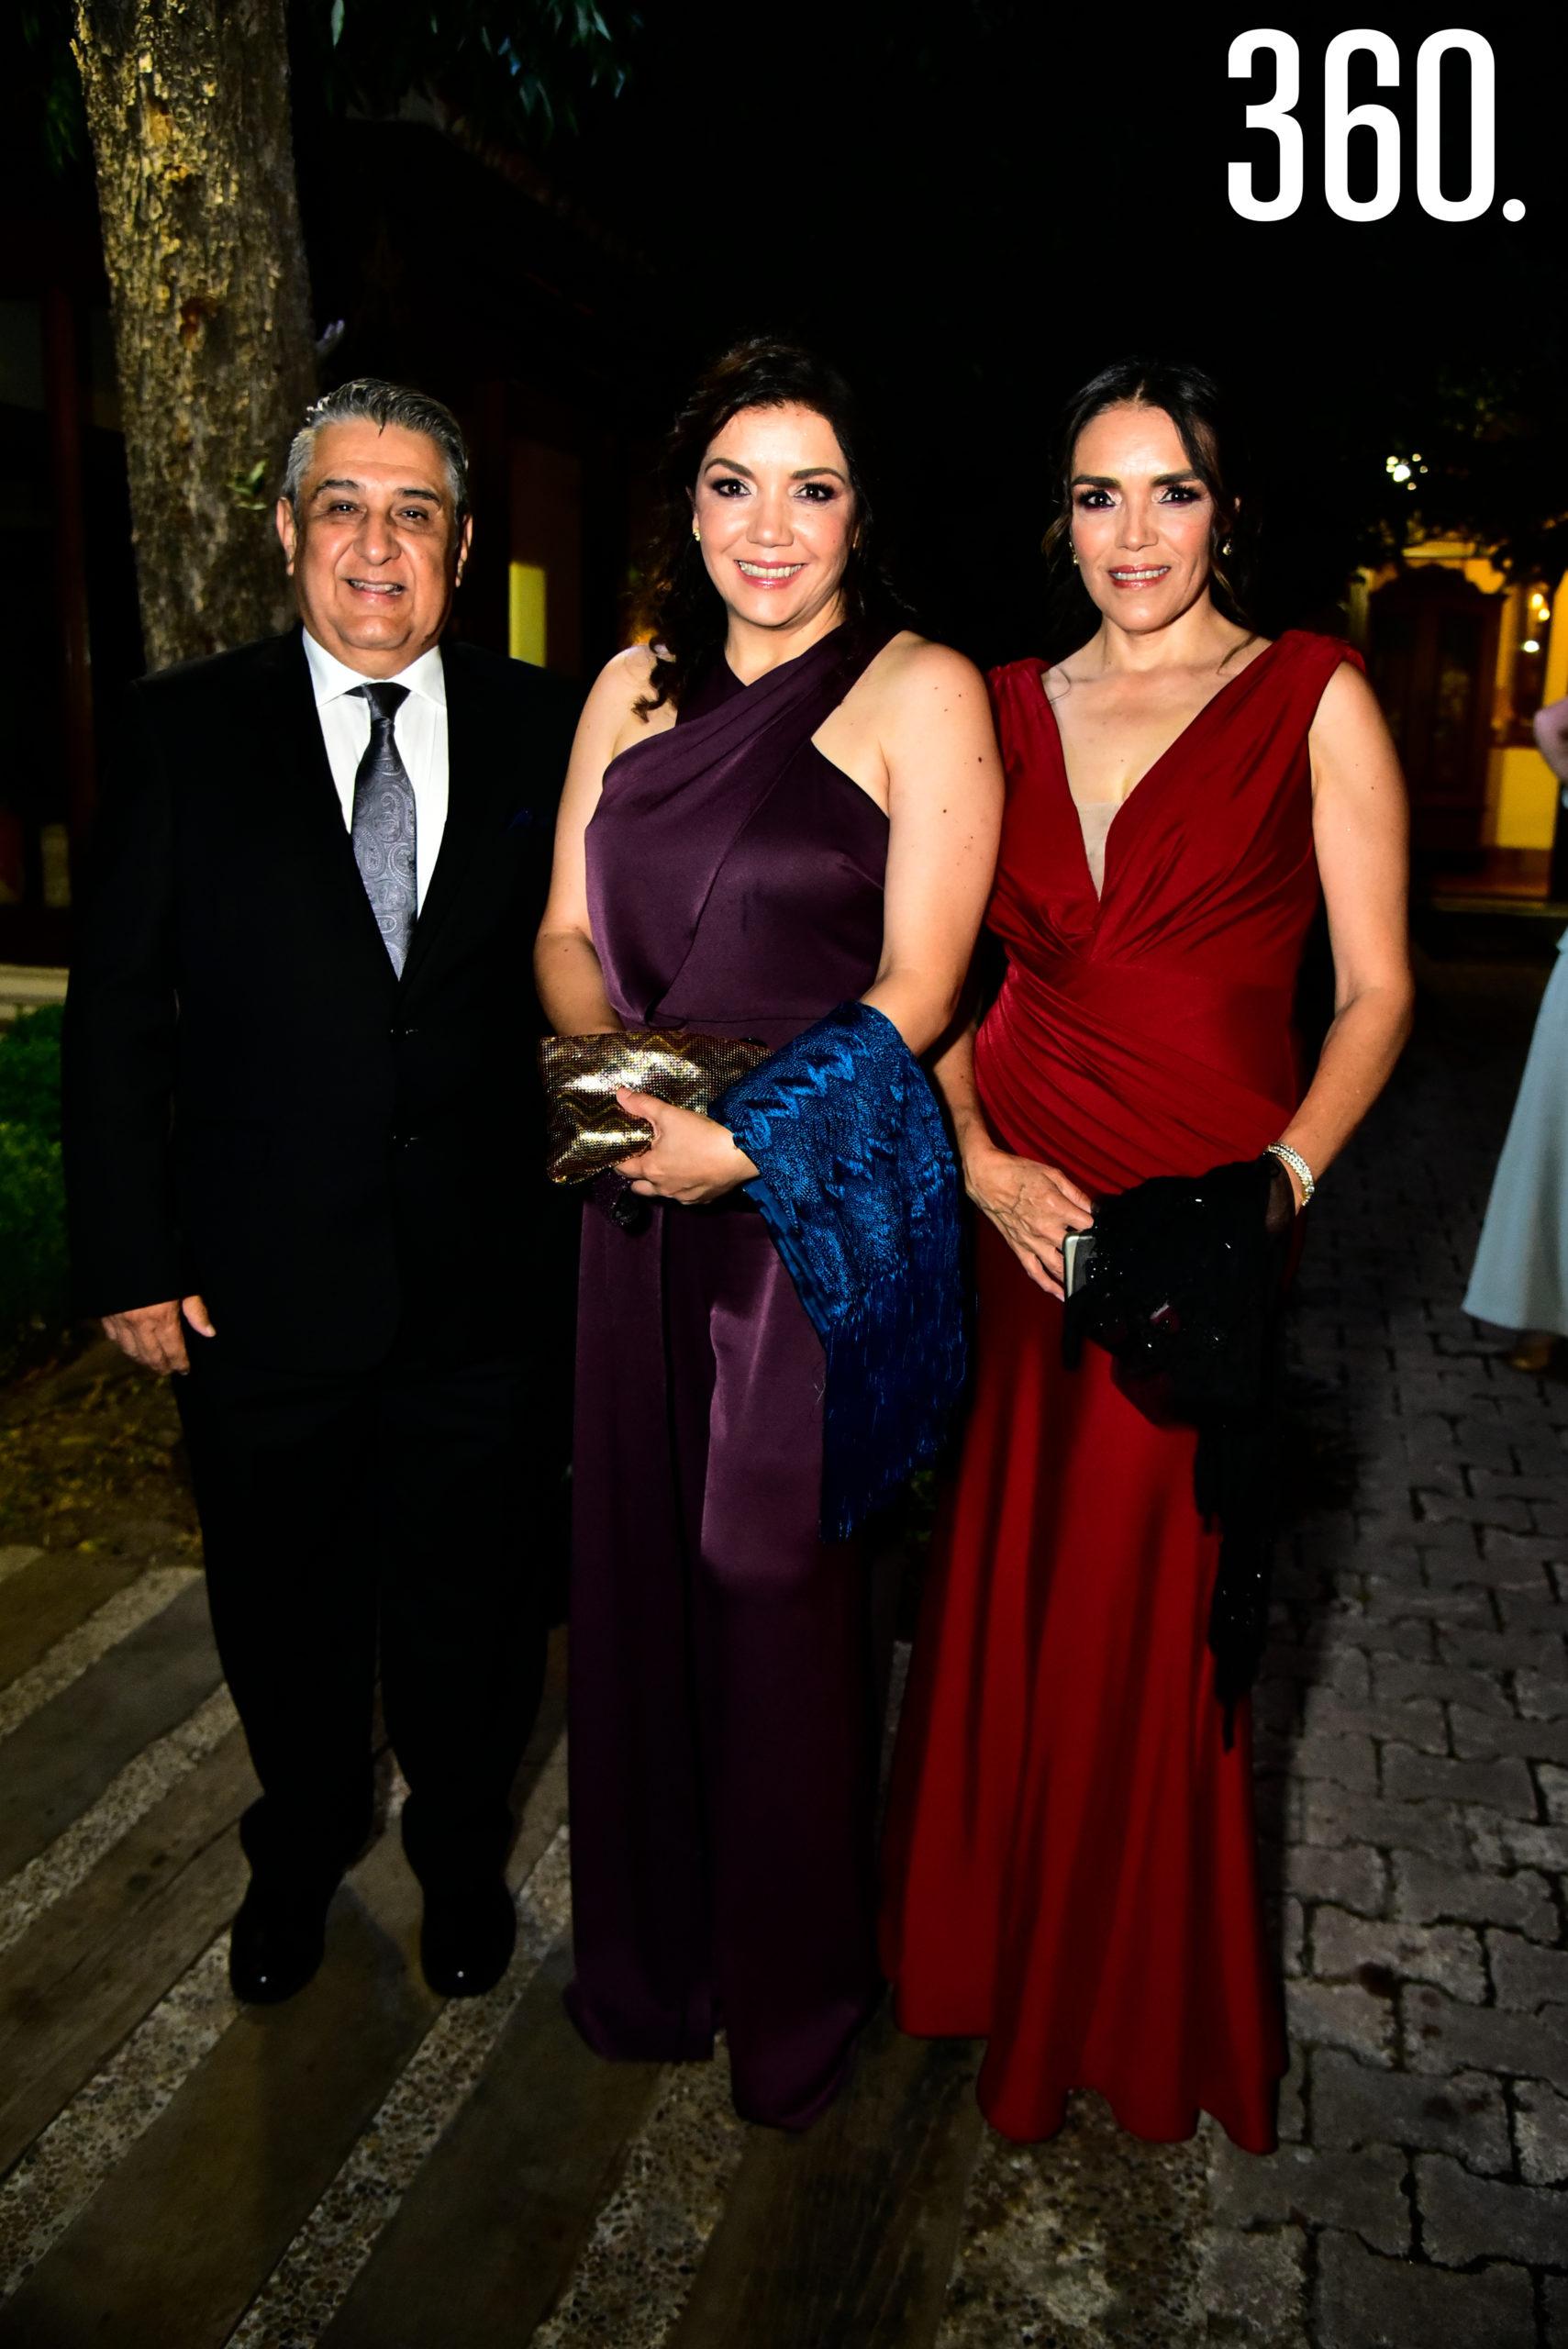 Jesús Canales, Cori Berrueto y Alejandra Berrueto.